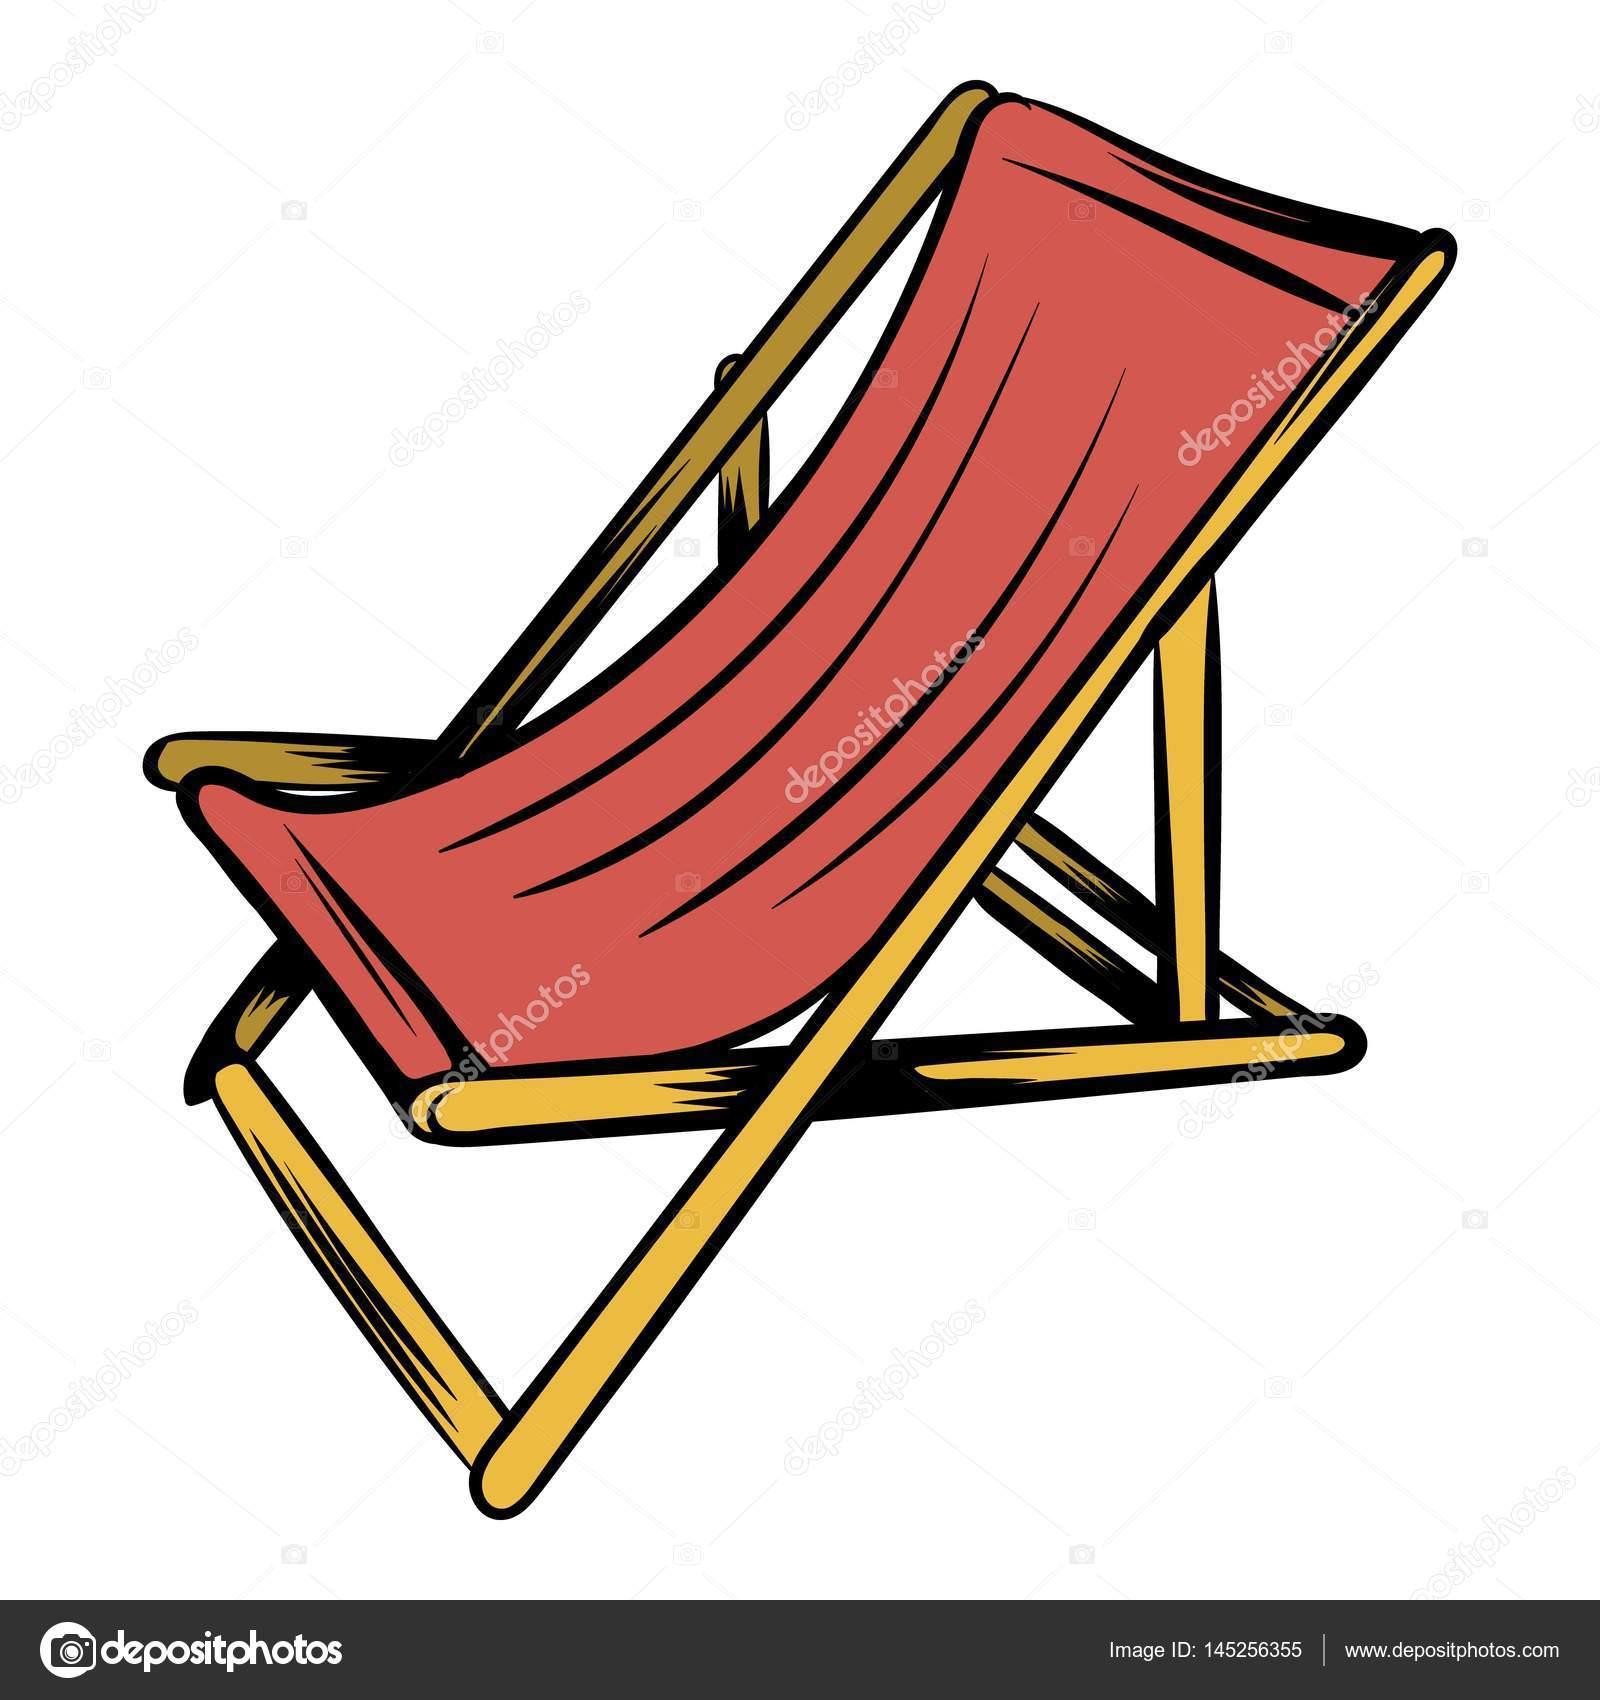 Wooden Beach Chaise Icon Cartoon Stock Vector C Juliarstudio